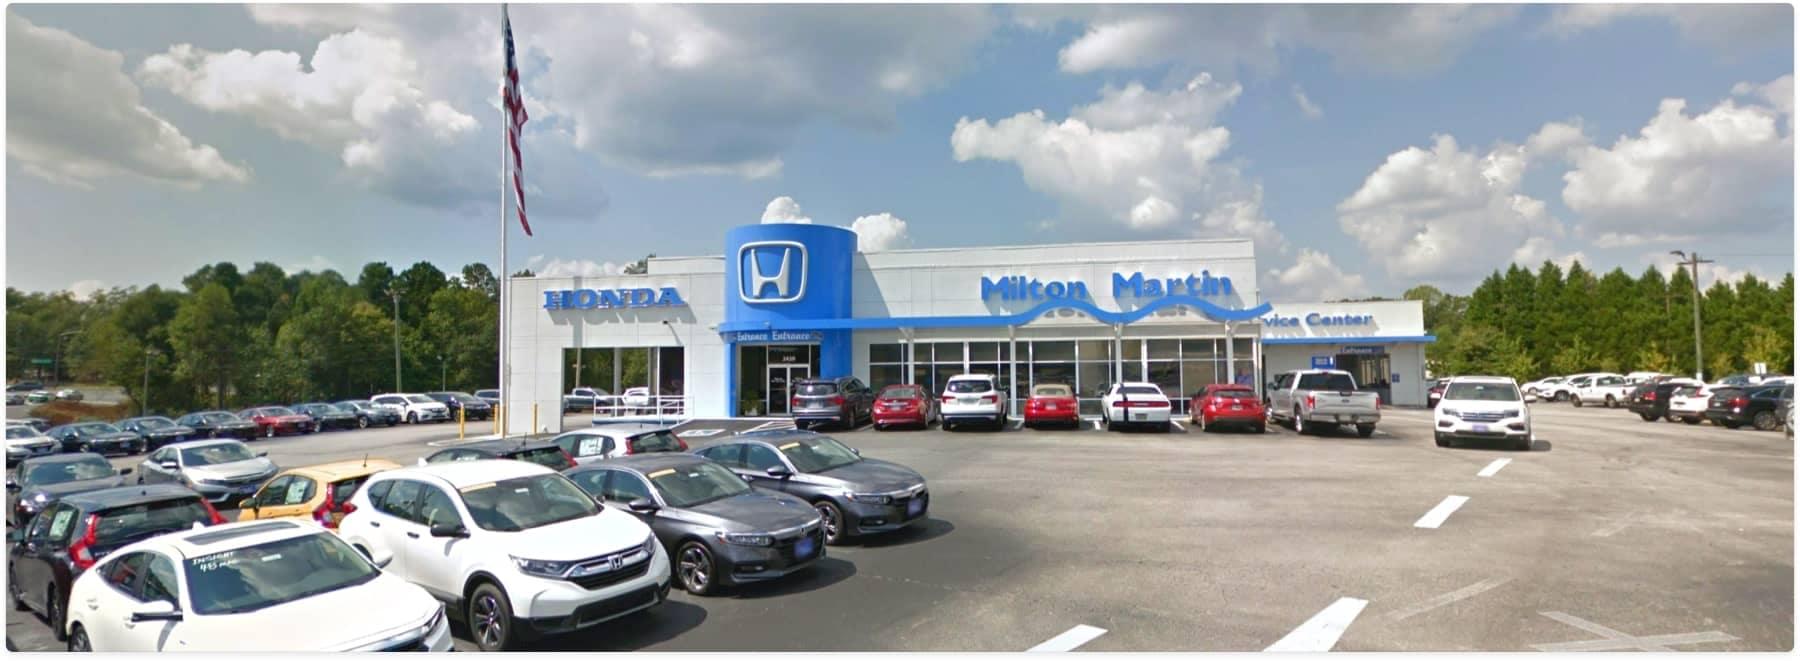 Milton Martin Honda Dealership